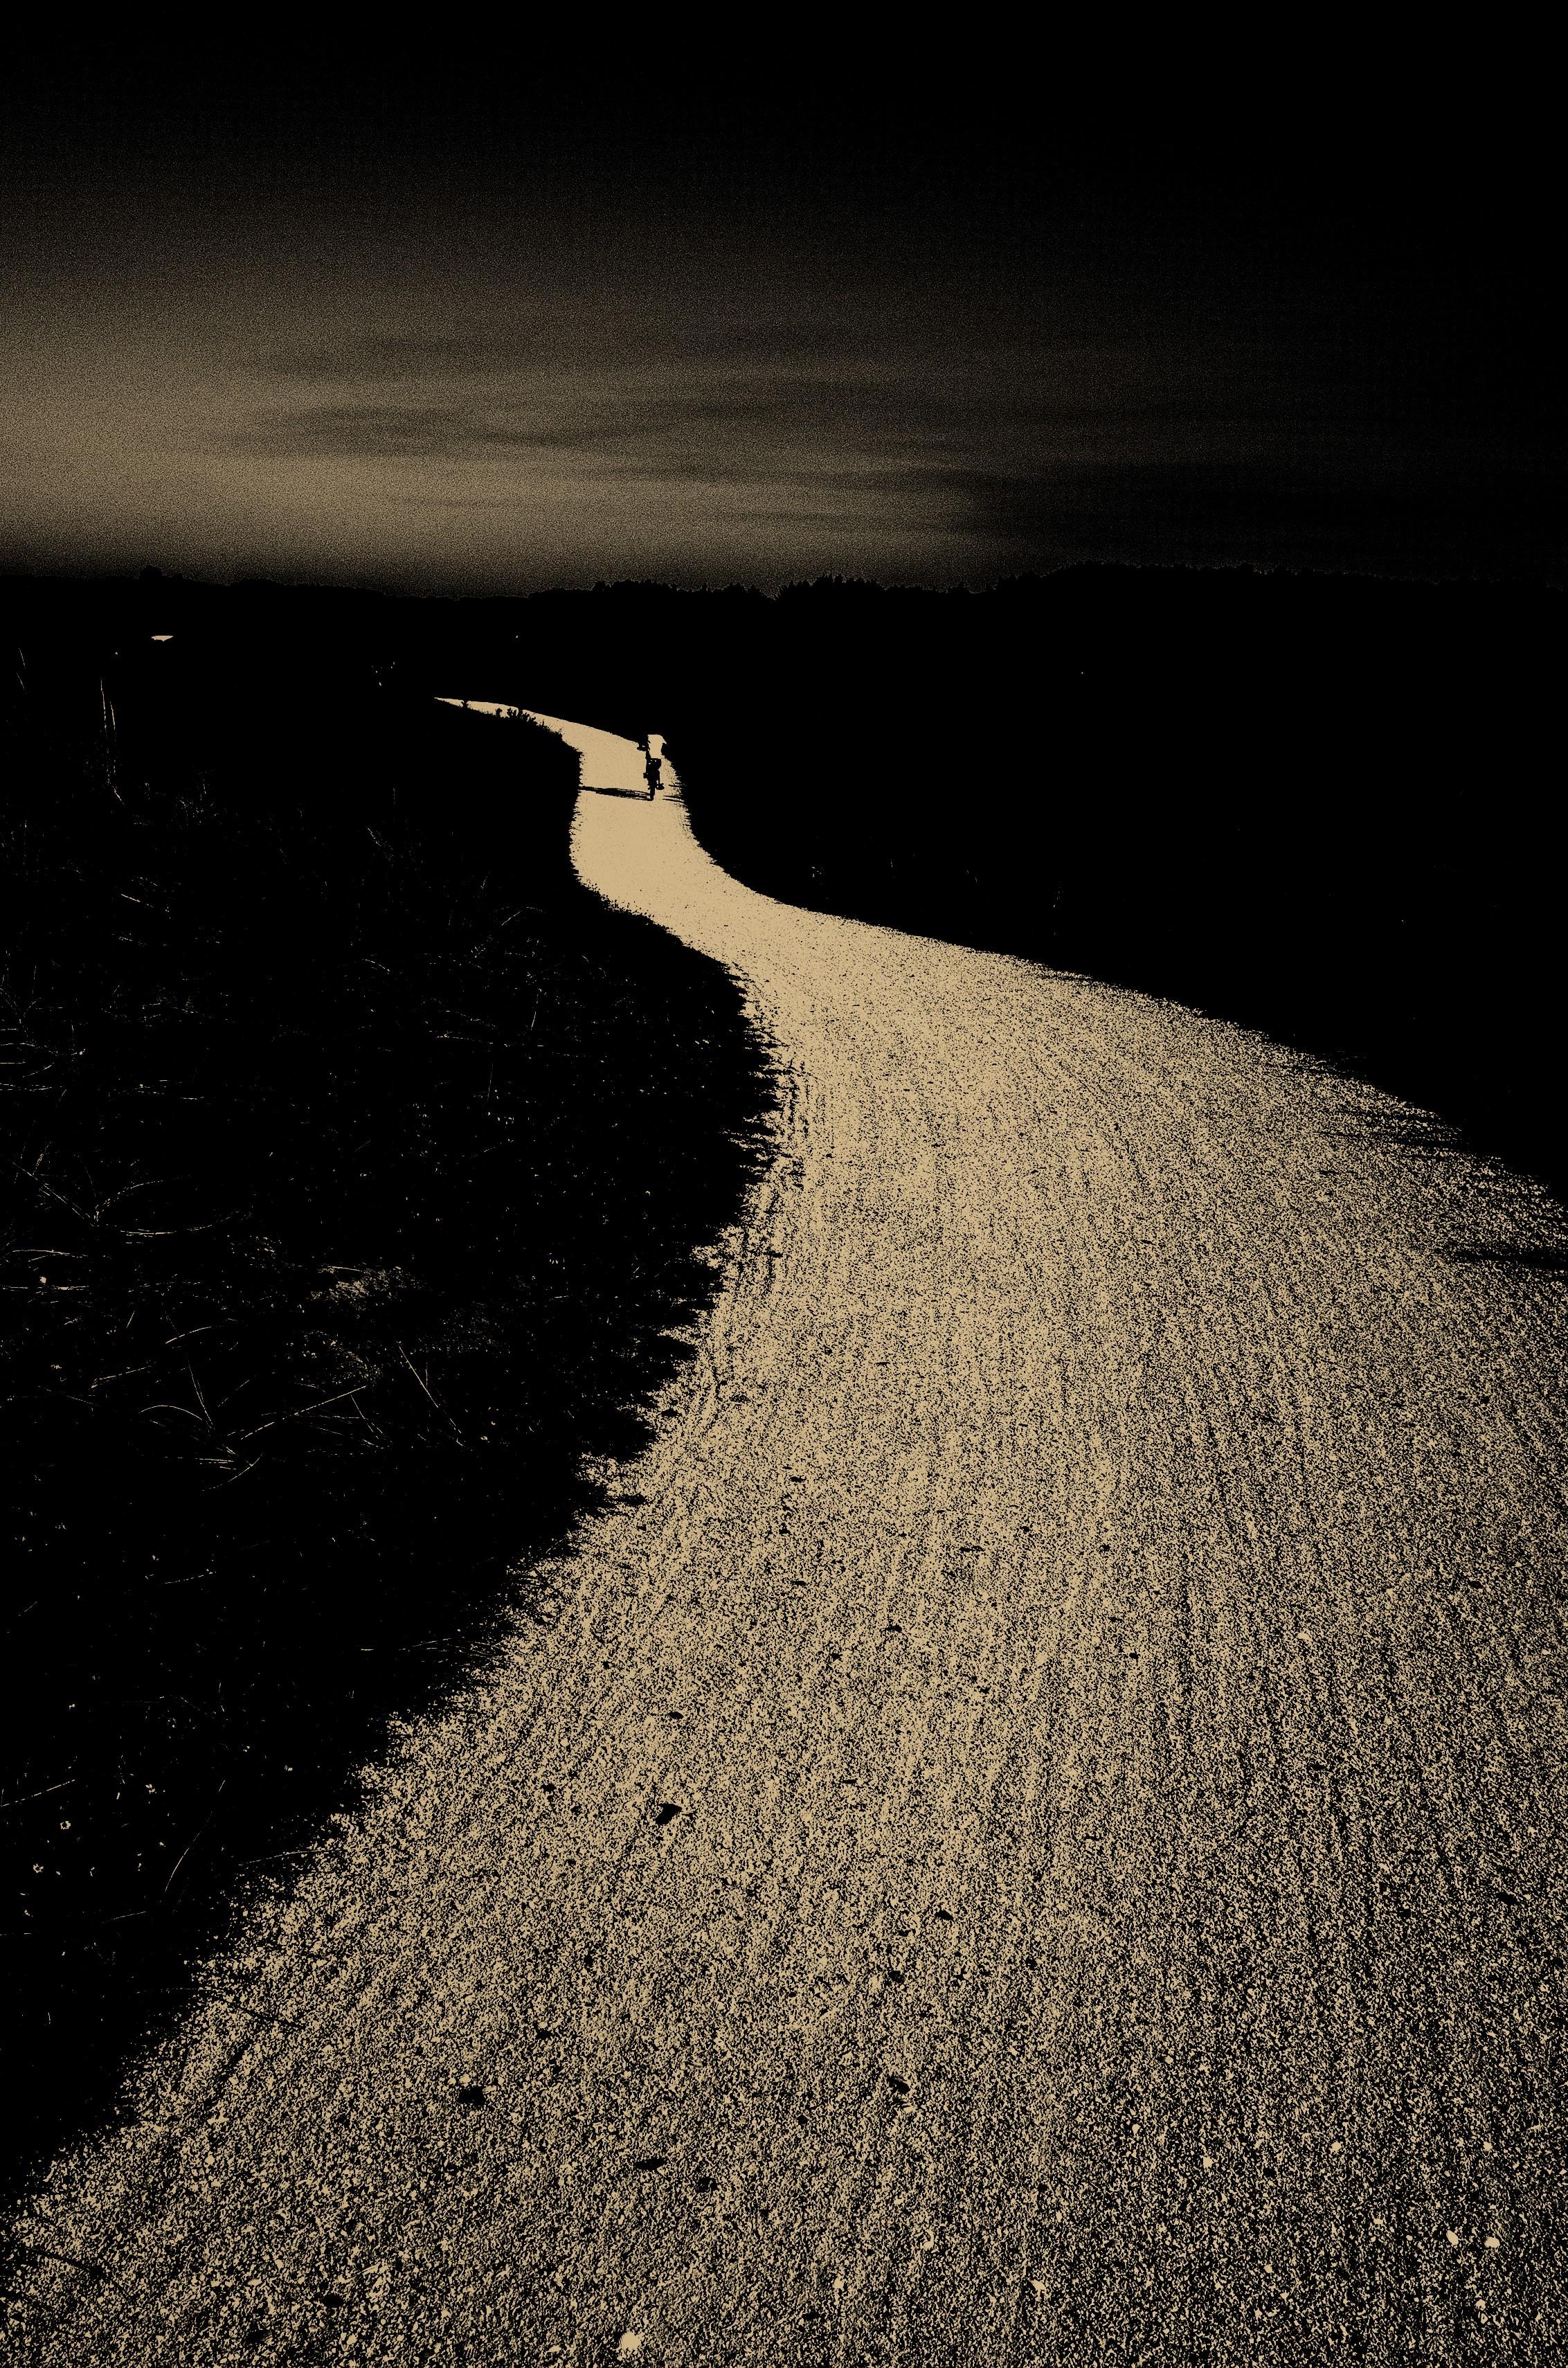 Остров на Луне, 2020. Фотограф Пол Купидо